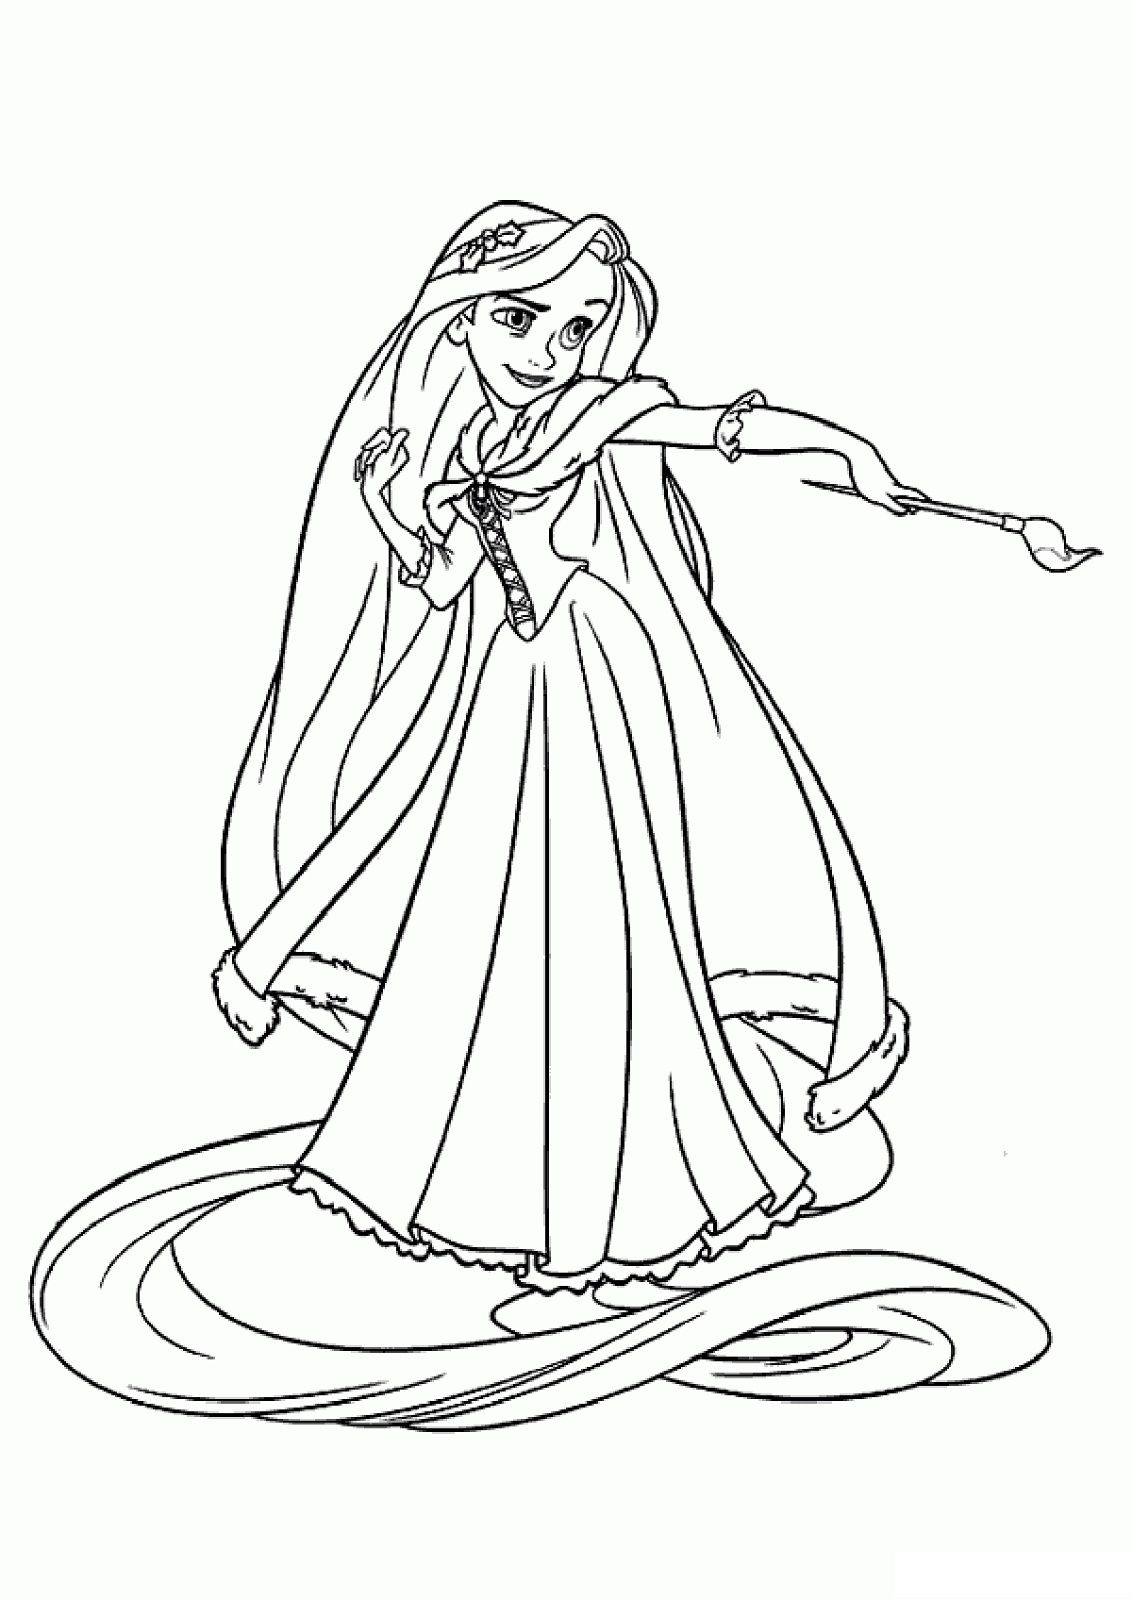 Tangled Printables For Kids Disney Coloring Pages Rapunzel Coloring Pages Cartoon Coloring Pages